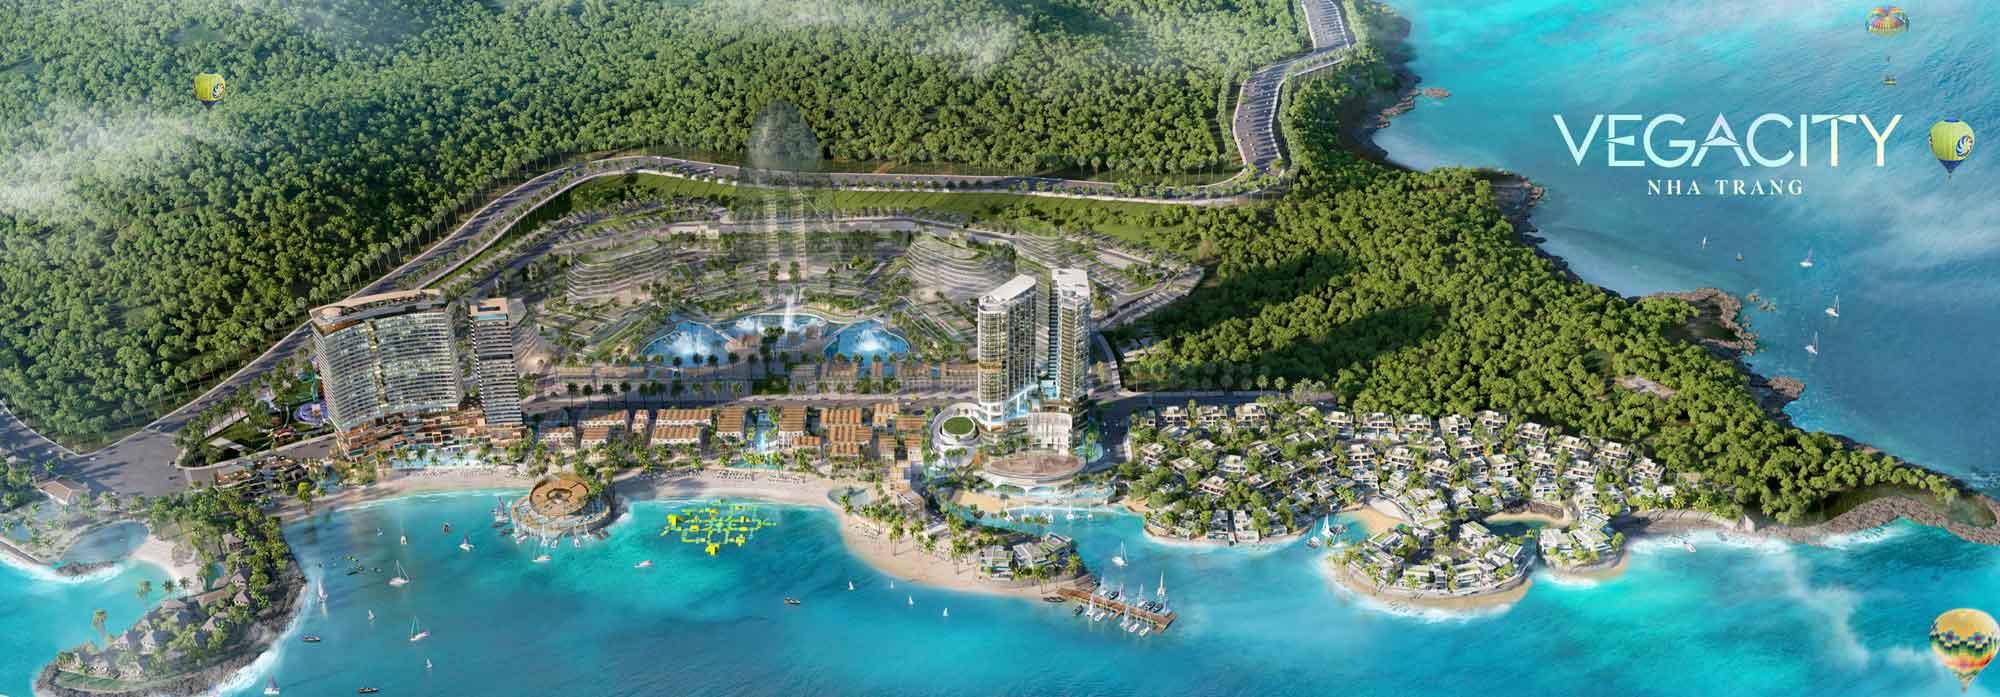 Vega City Nha Trang